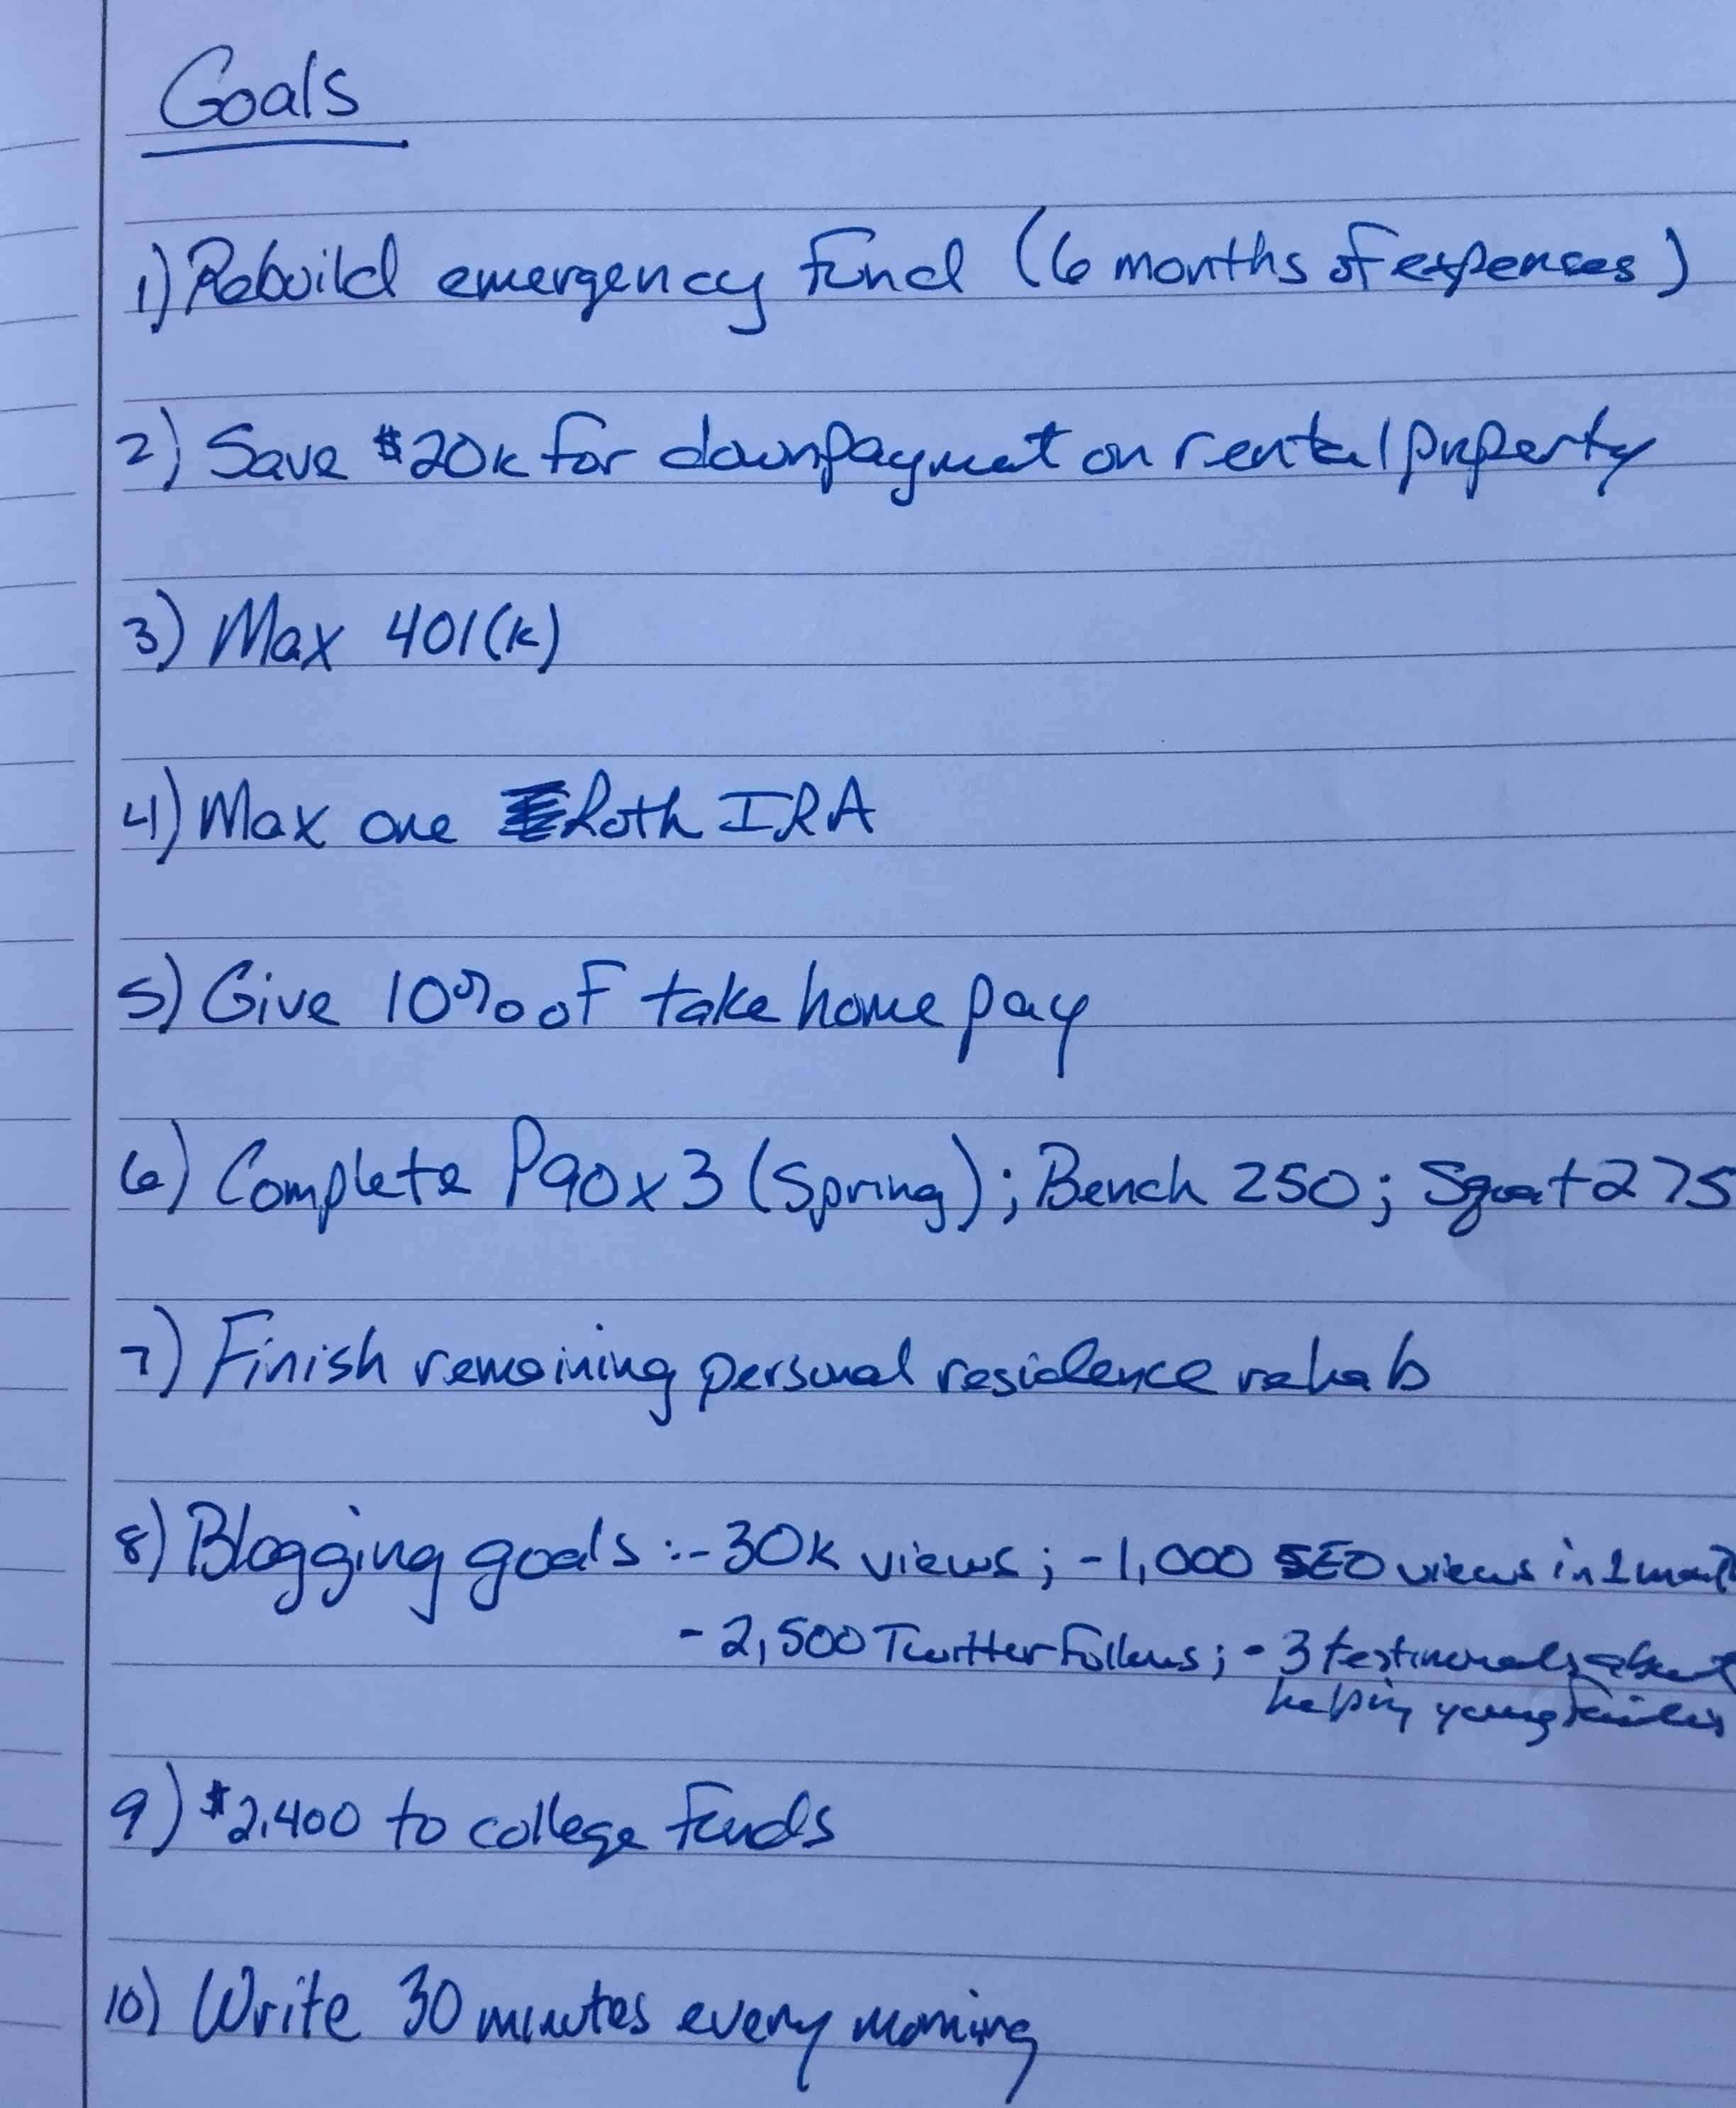 Photo of handwritten personal goals for 2019